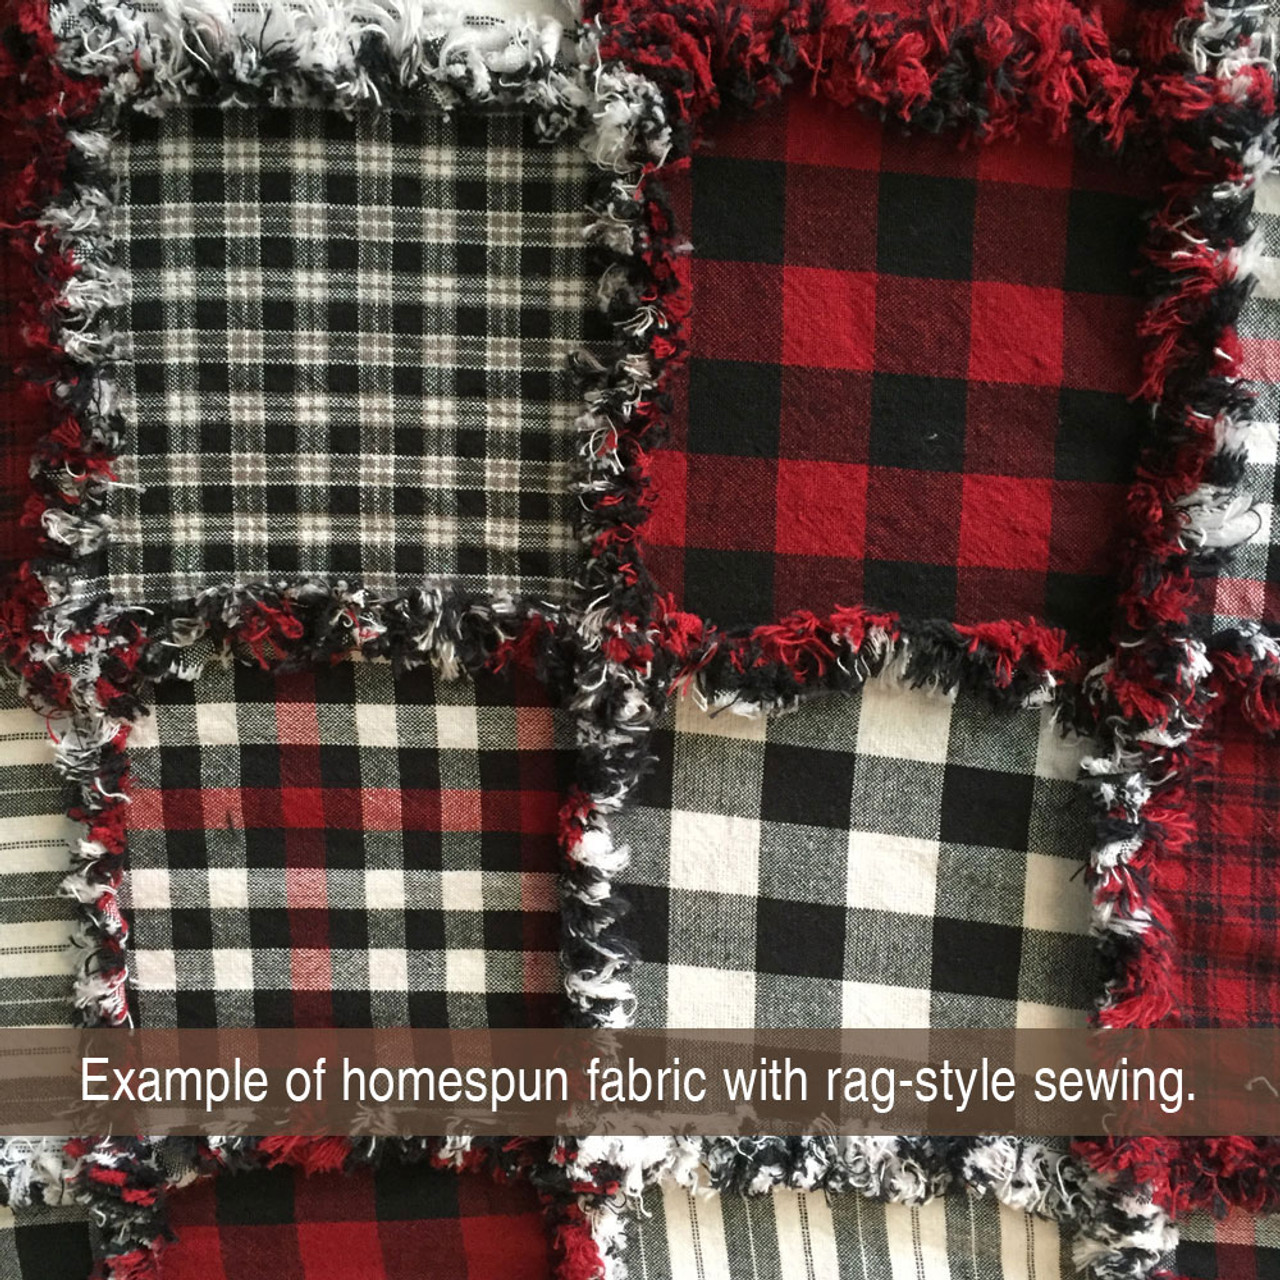 40 Lodge Buffalo Plaid Homespun 5 inch Quilt Squares